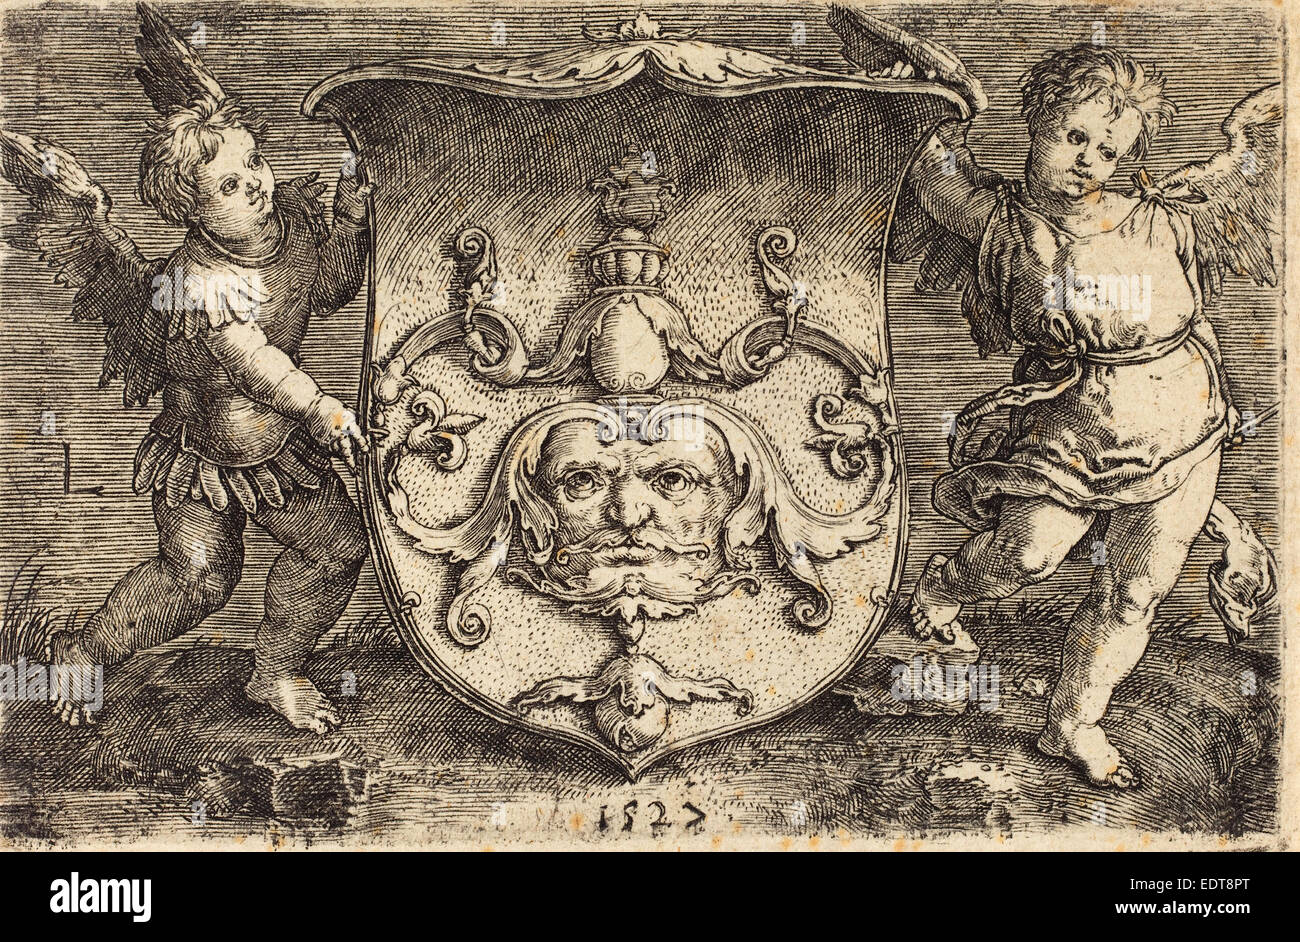 1488 - 1532), Shield with Mascaron,